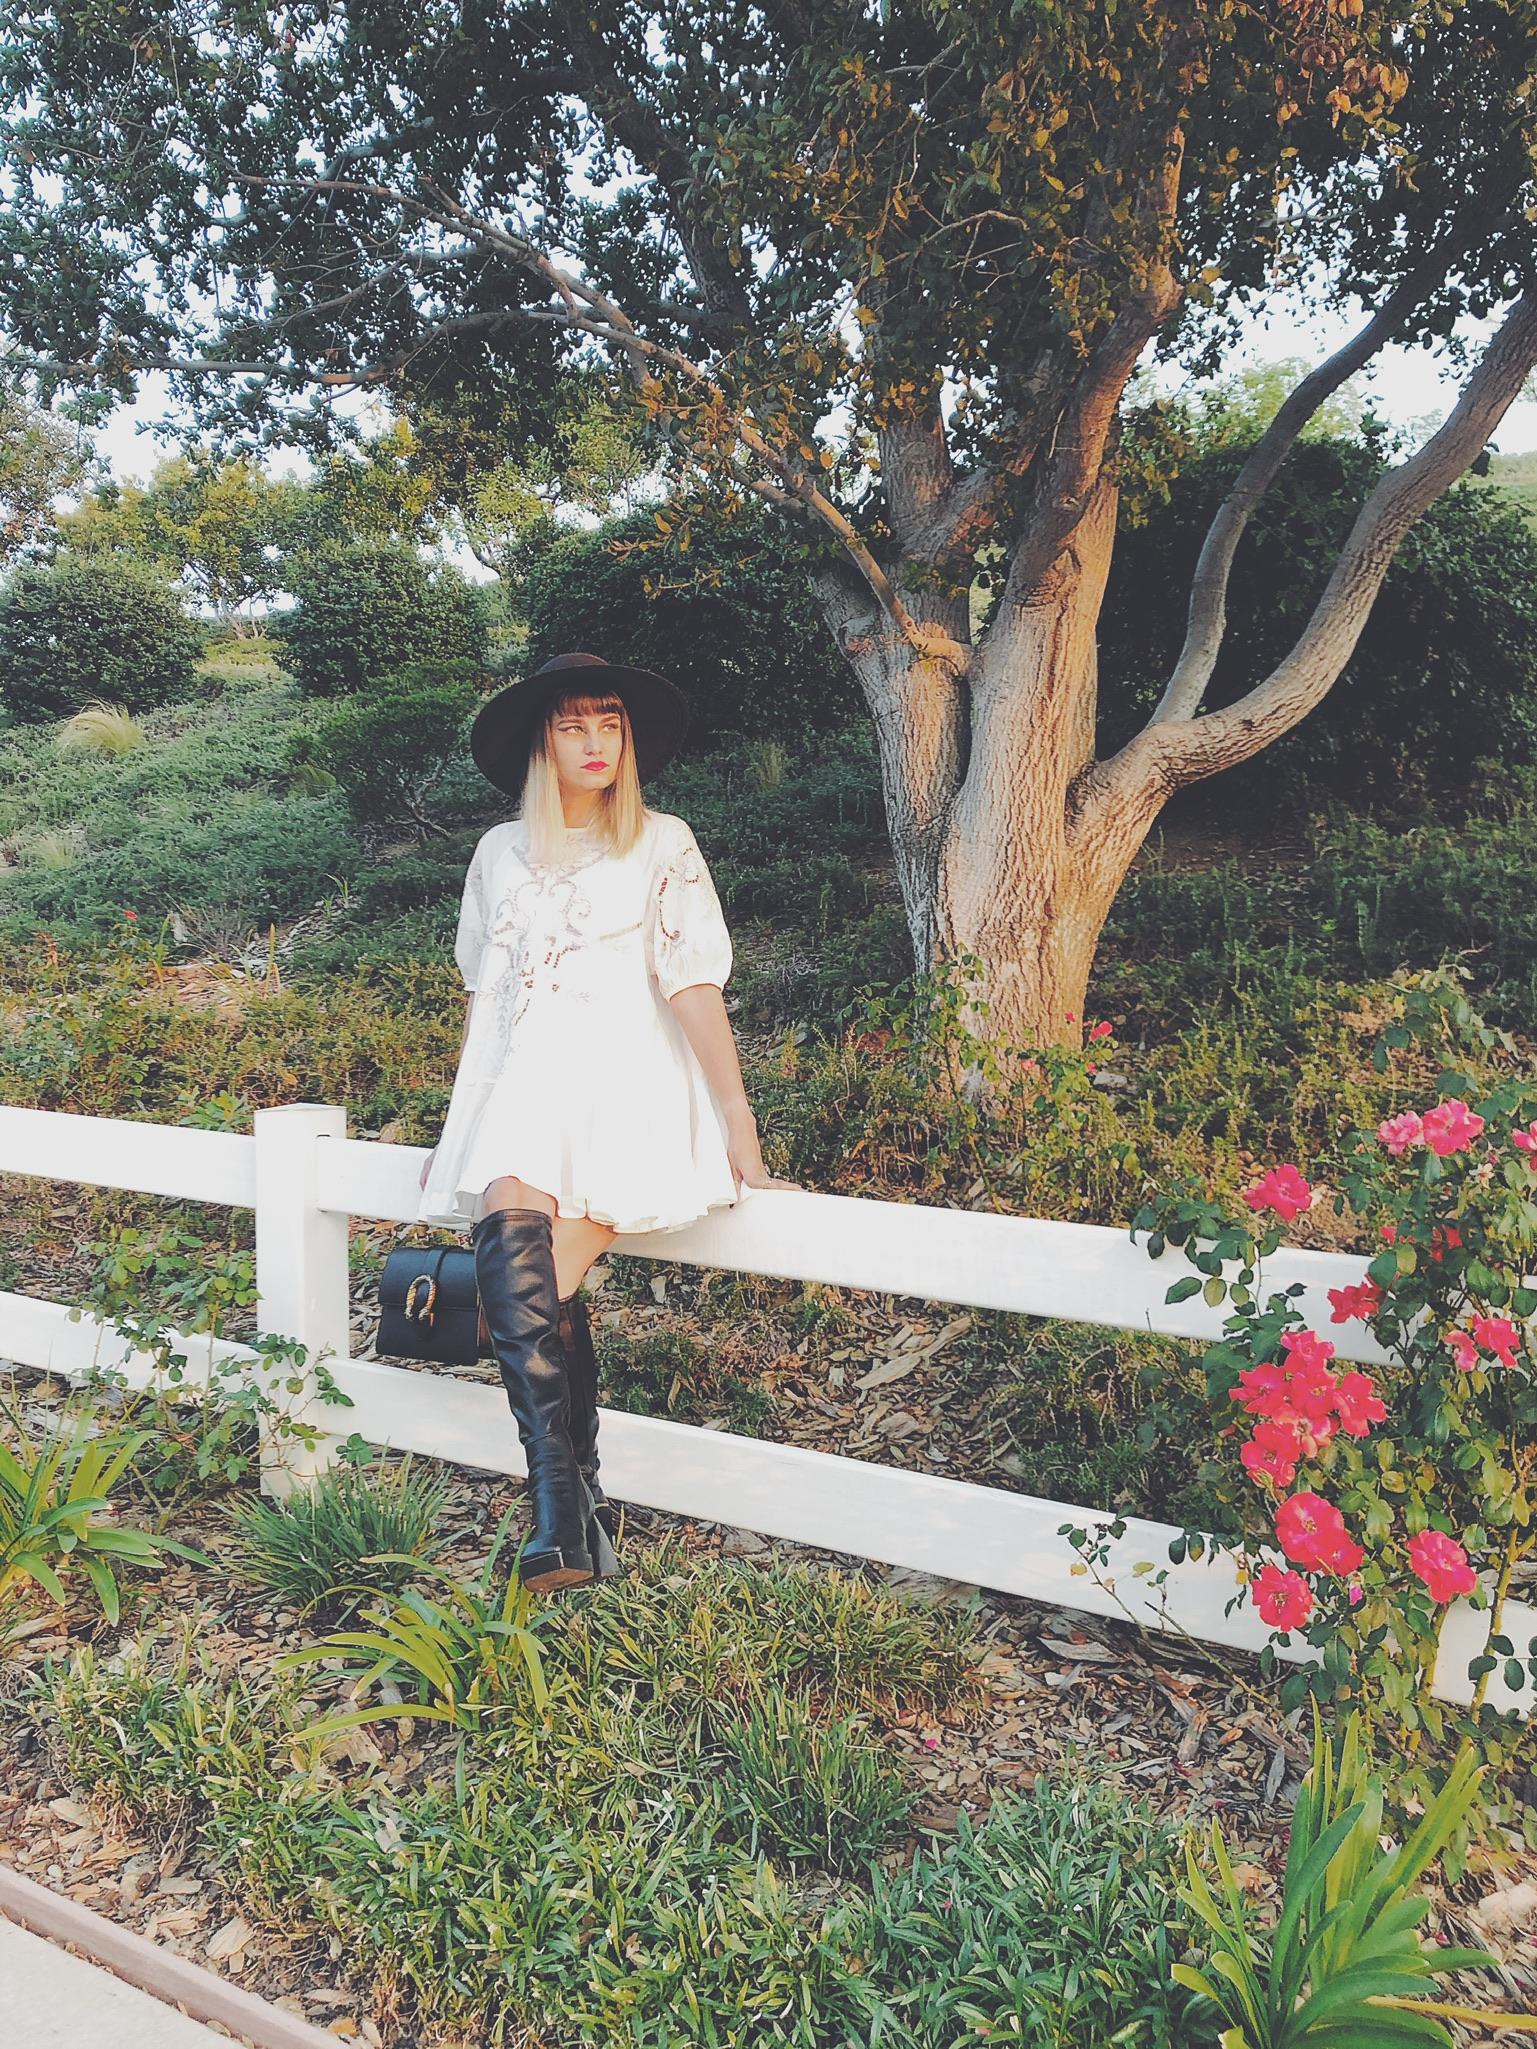 Annie Claire Hudson for Charlie Girls Magazine